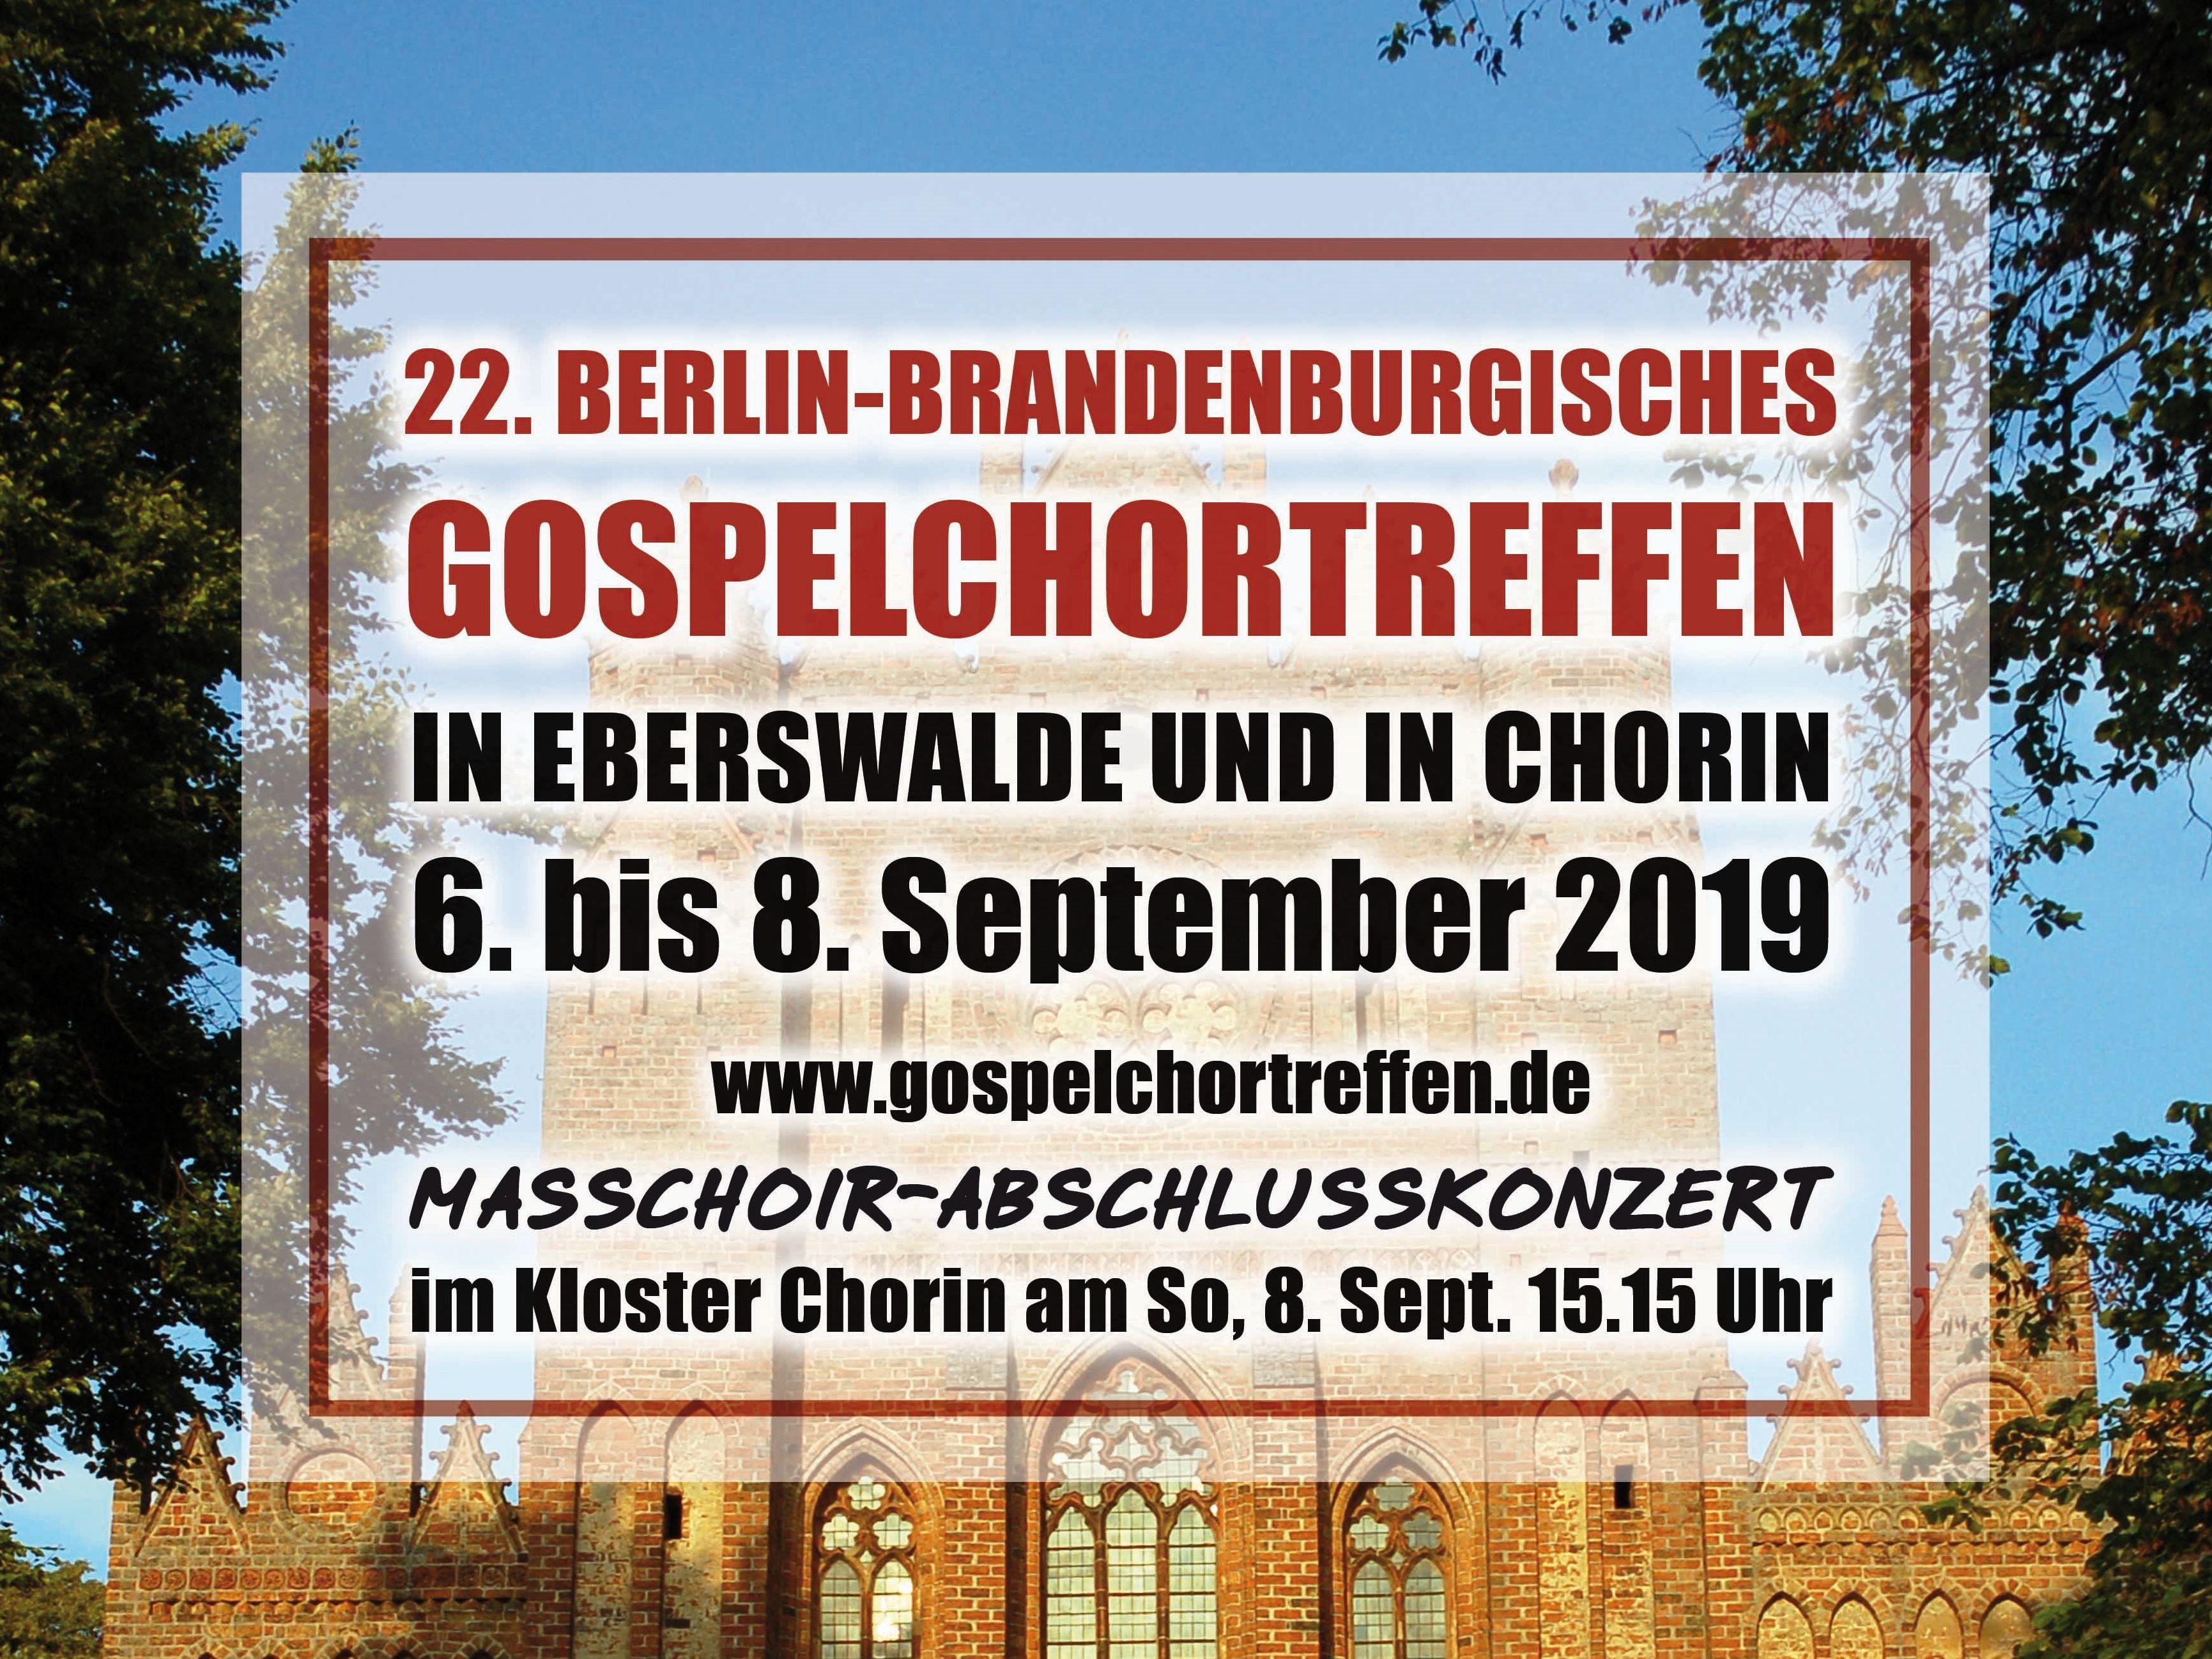 Gospelchortreffen_plakat_2019-2